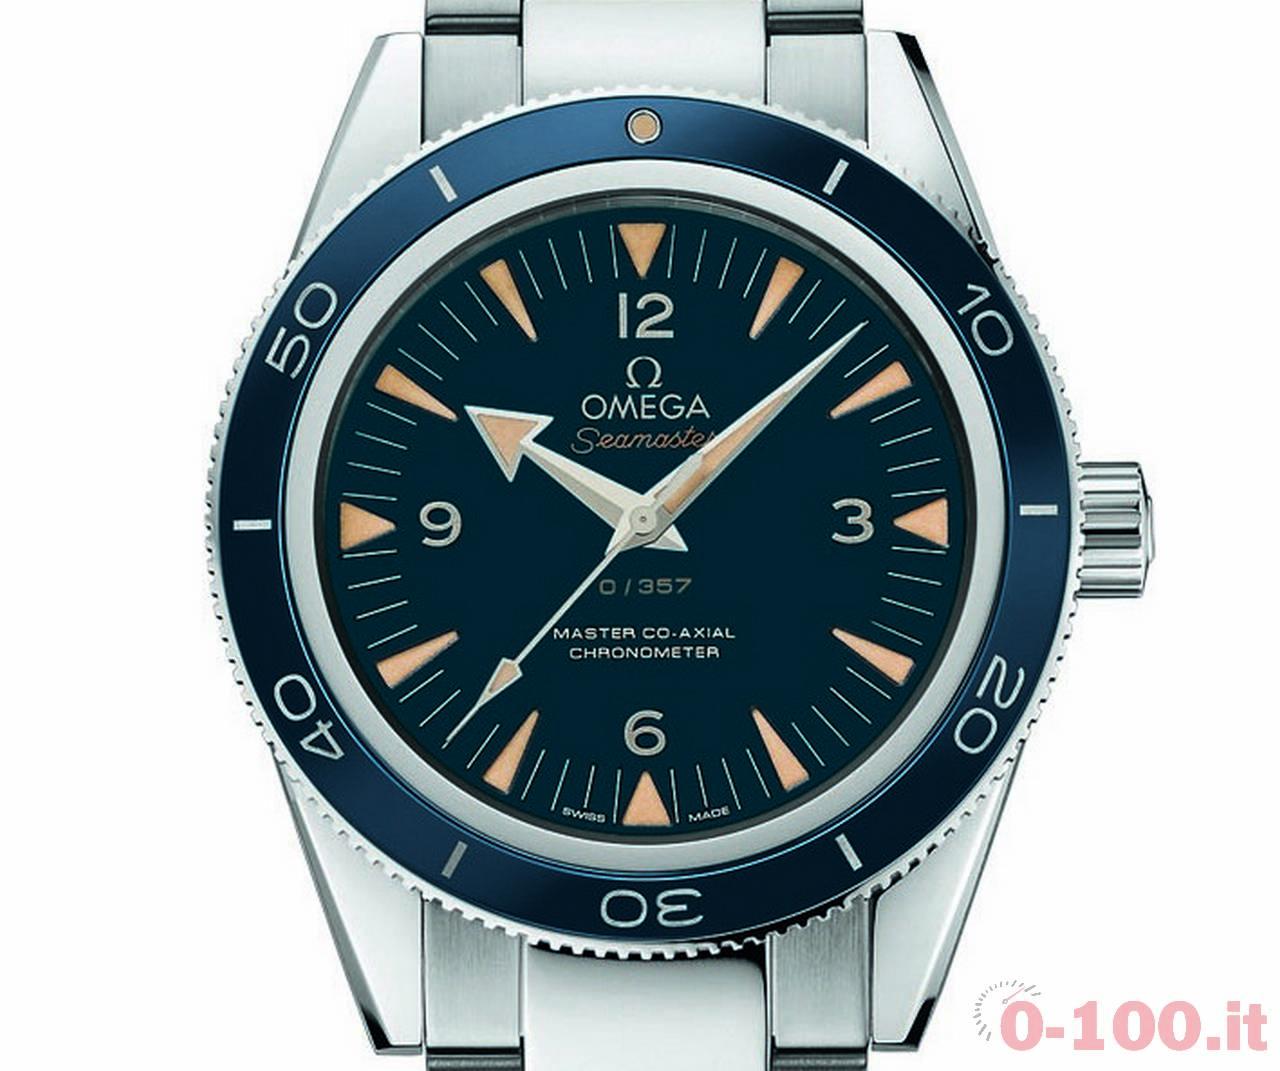 1b58e3a2edb Omega Seamaster 300 Limited Edition Ref. 233.90.41.21.03.002 - 0-100.it